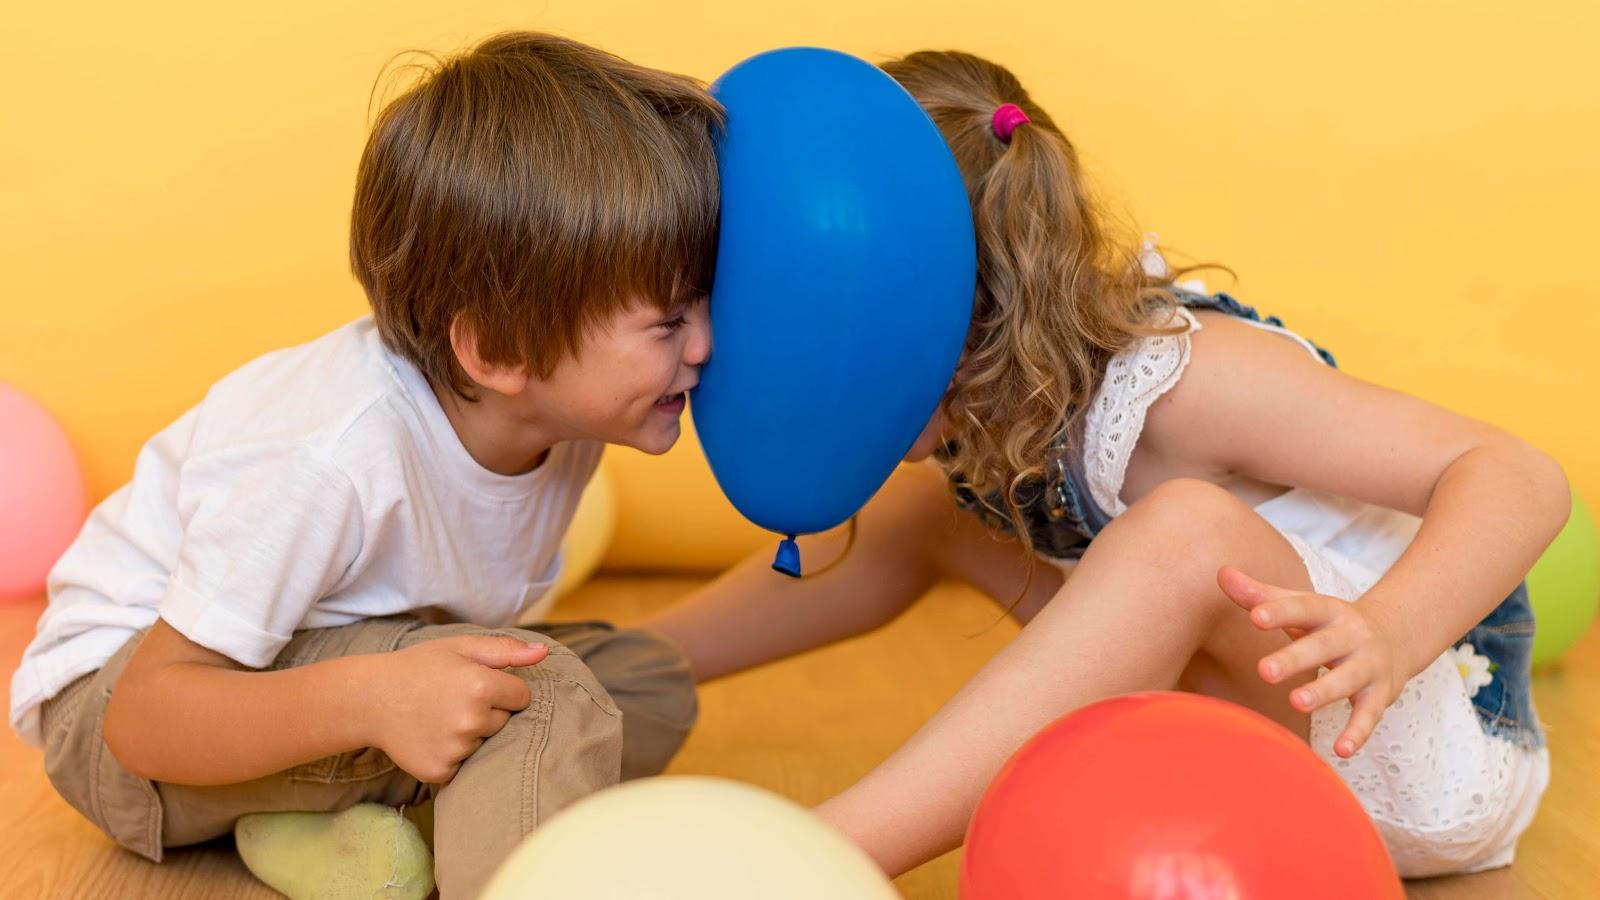 children's birthday party activities